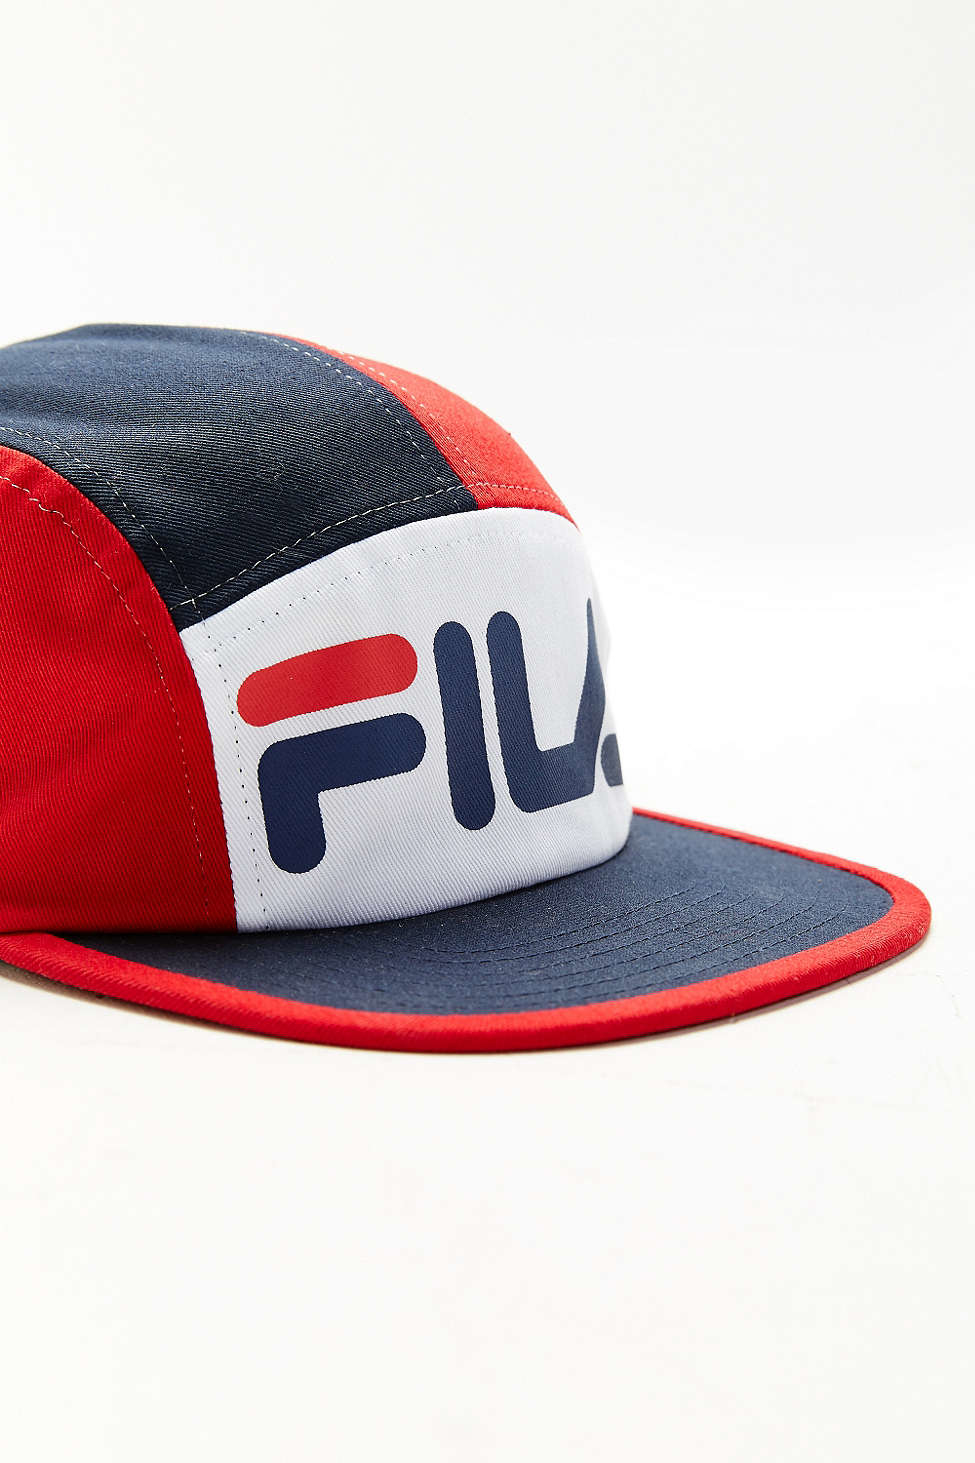 fe6a59e794e Lyst - Fila + Uo 5-panel Hat in Blue for Men